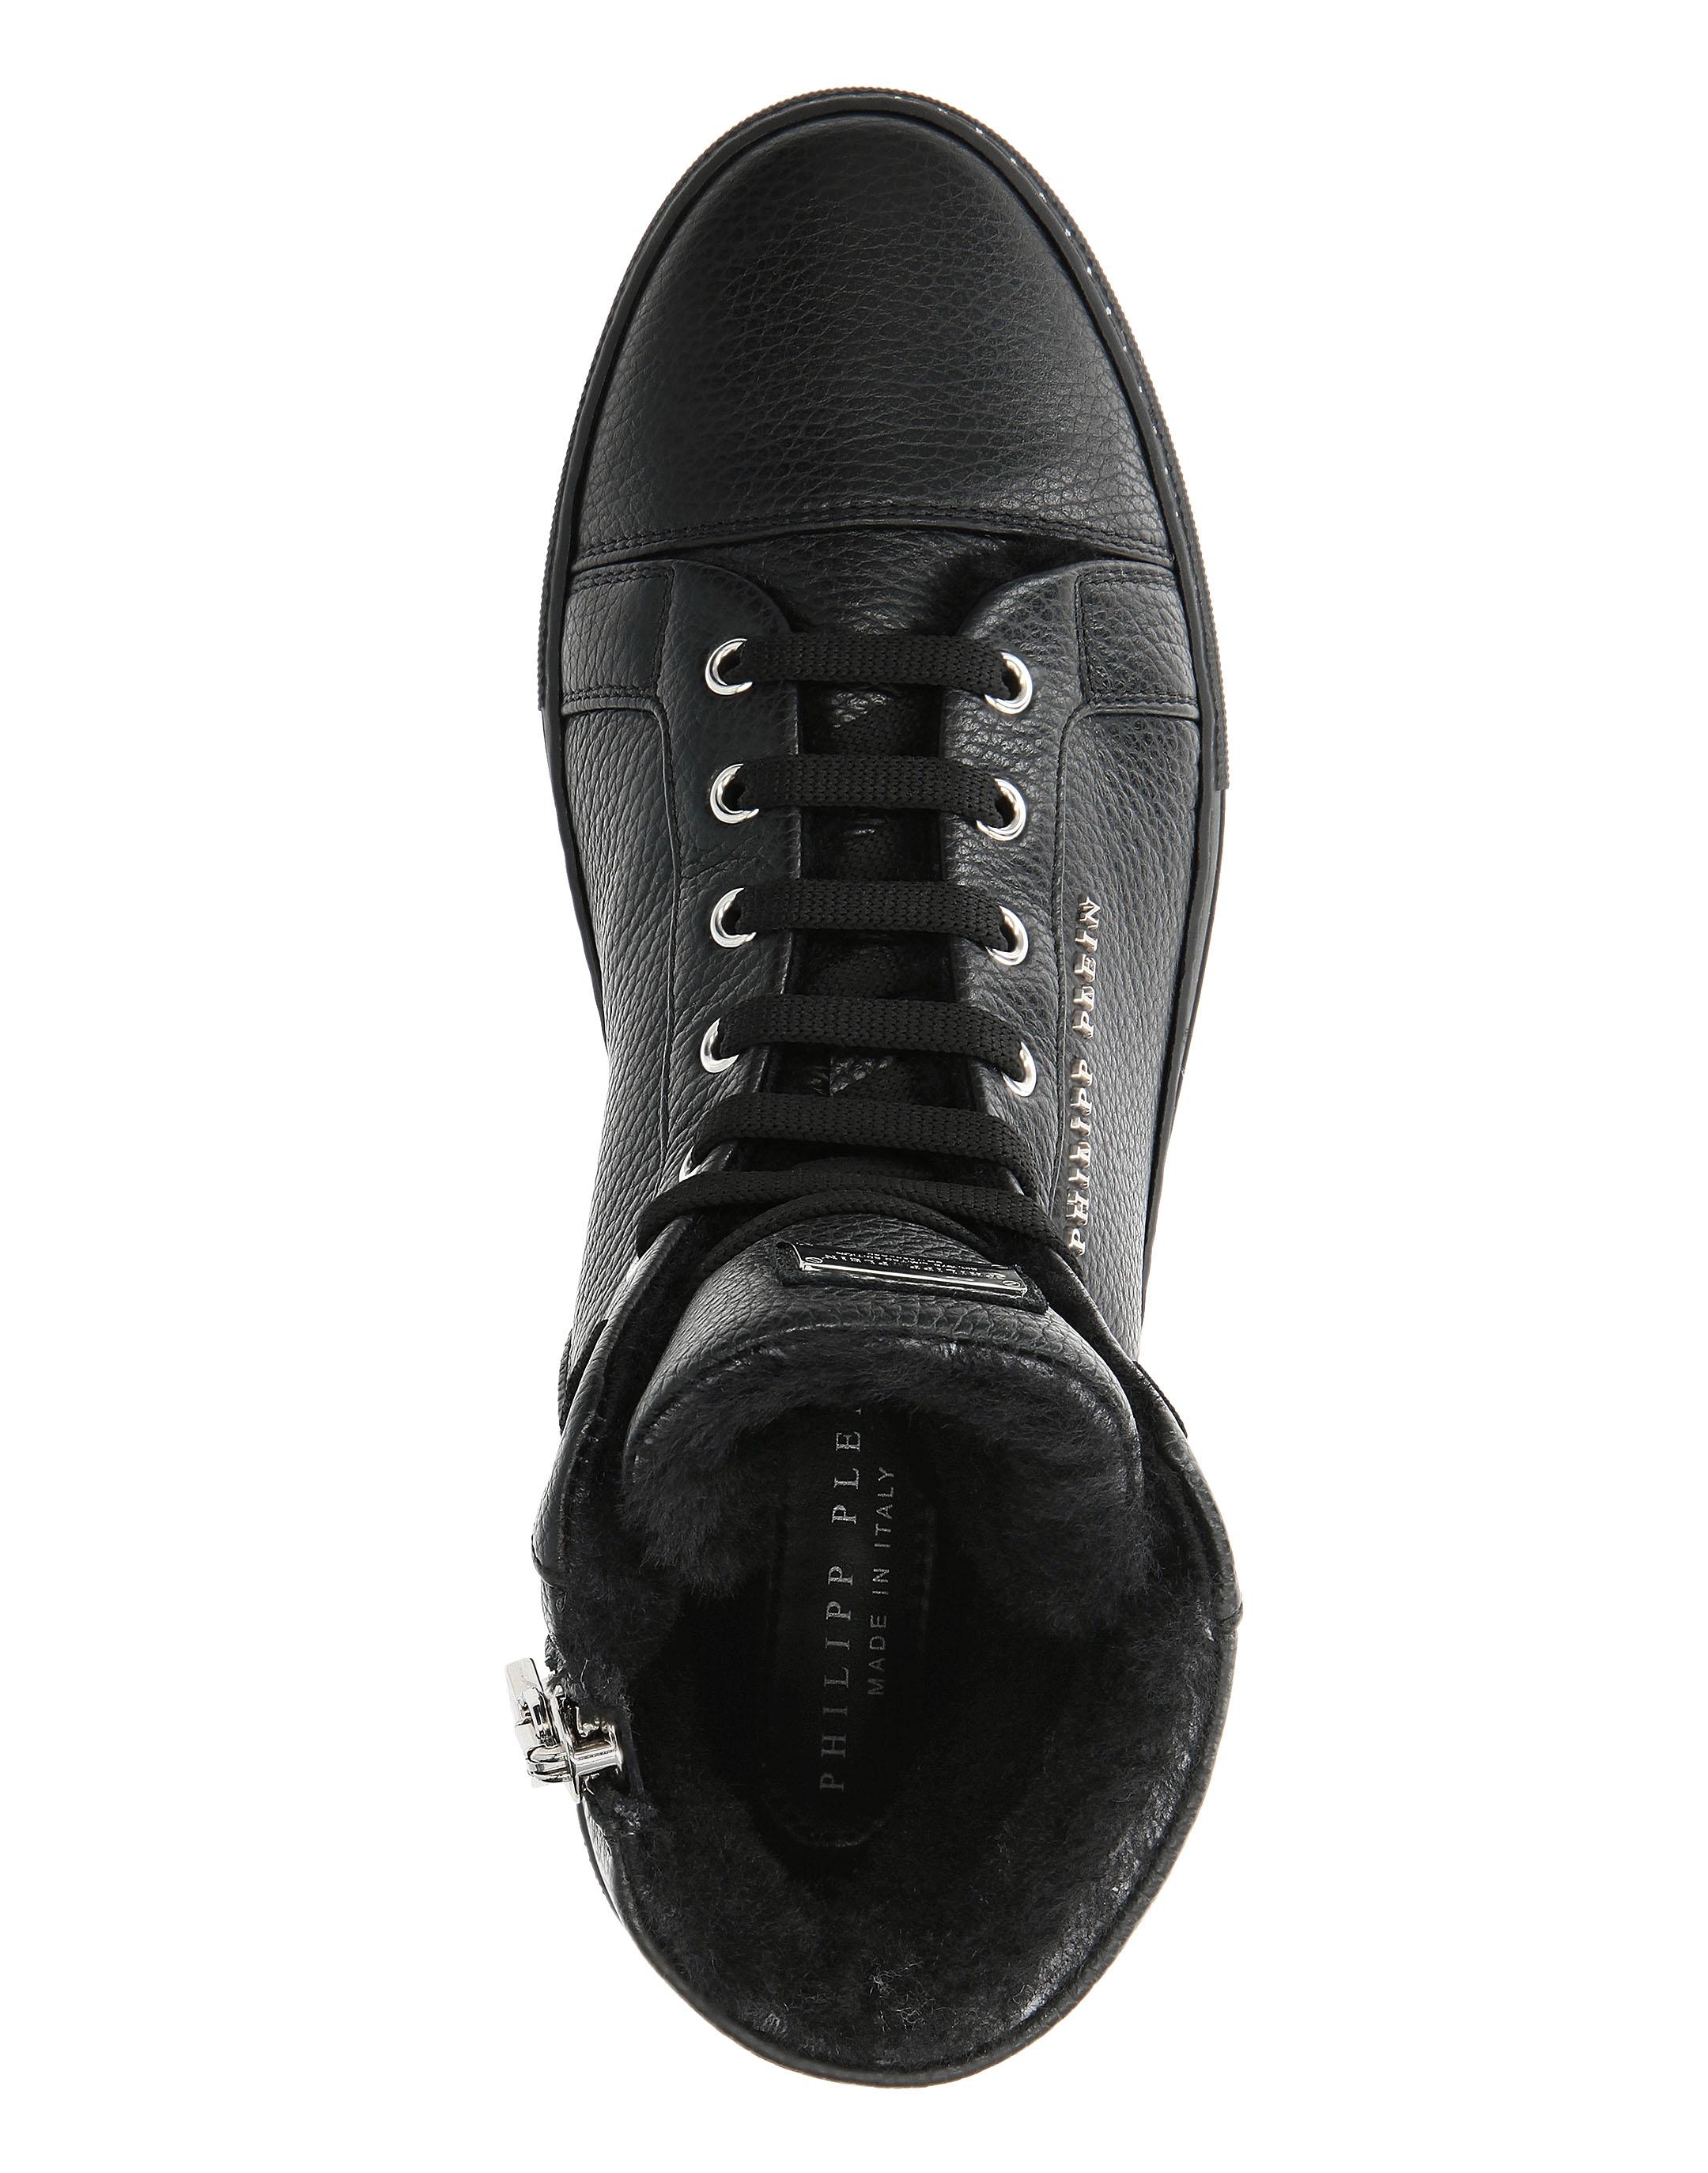 69734662d74 Hi-Top Sneakers Sharp